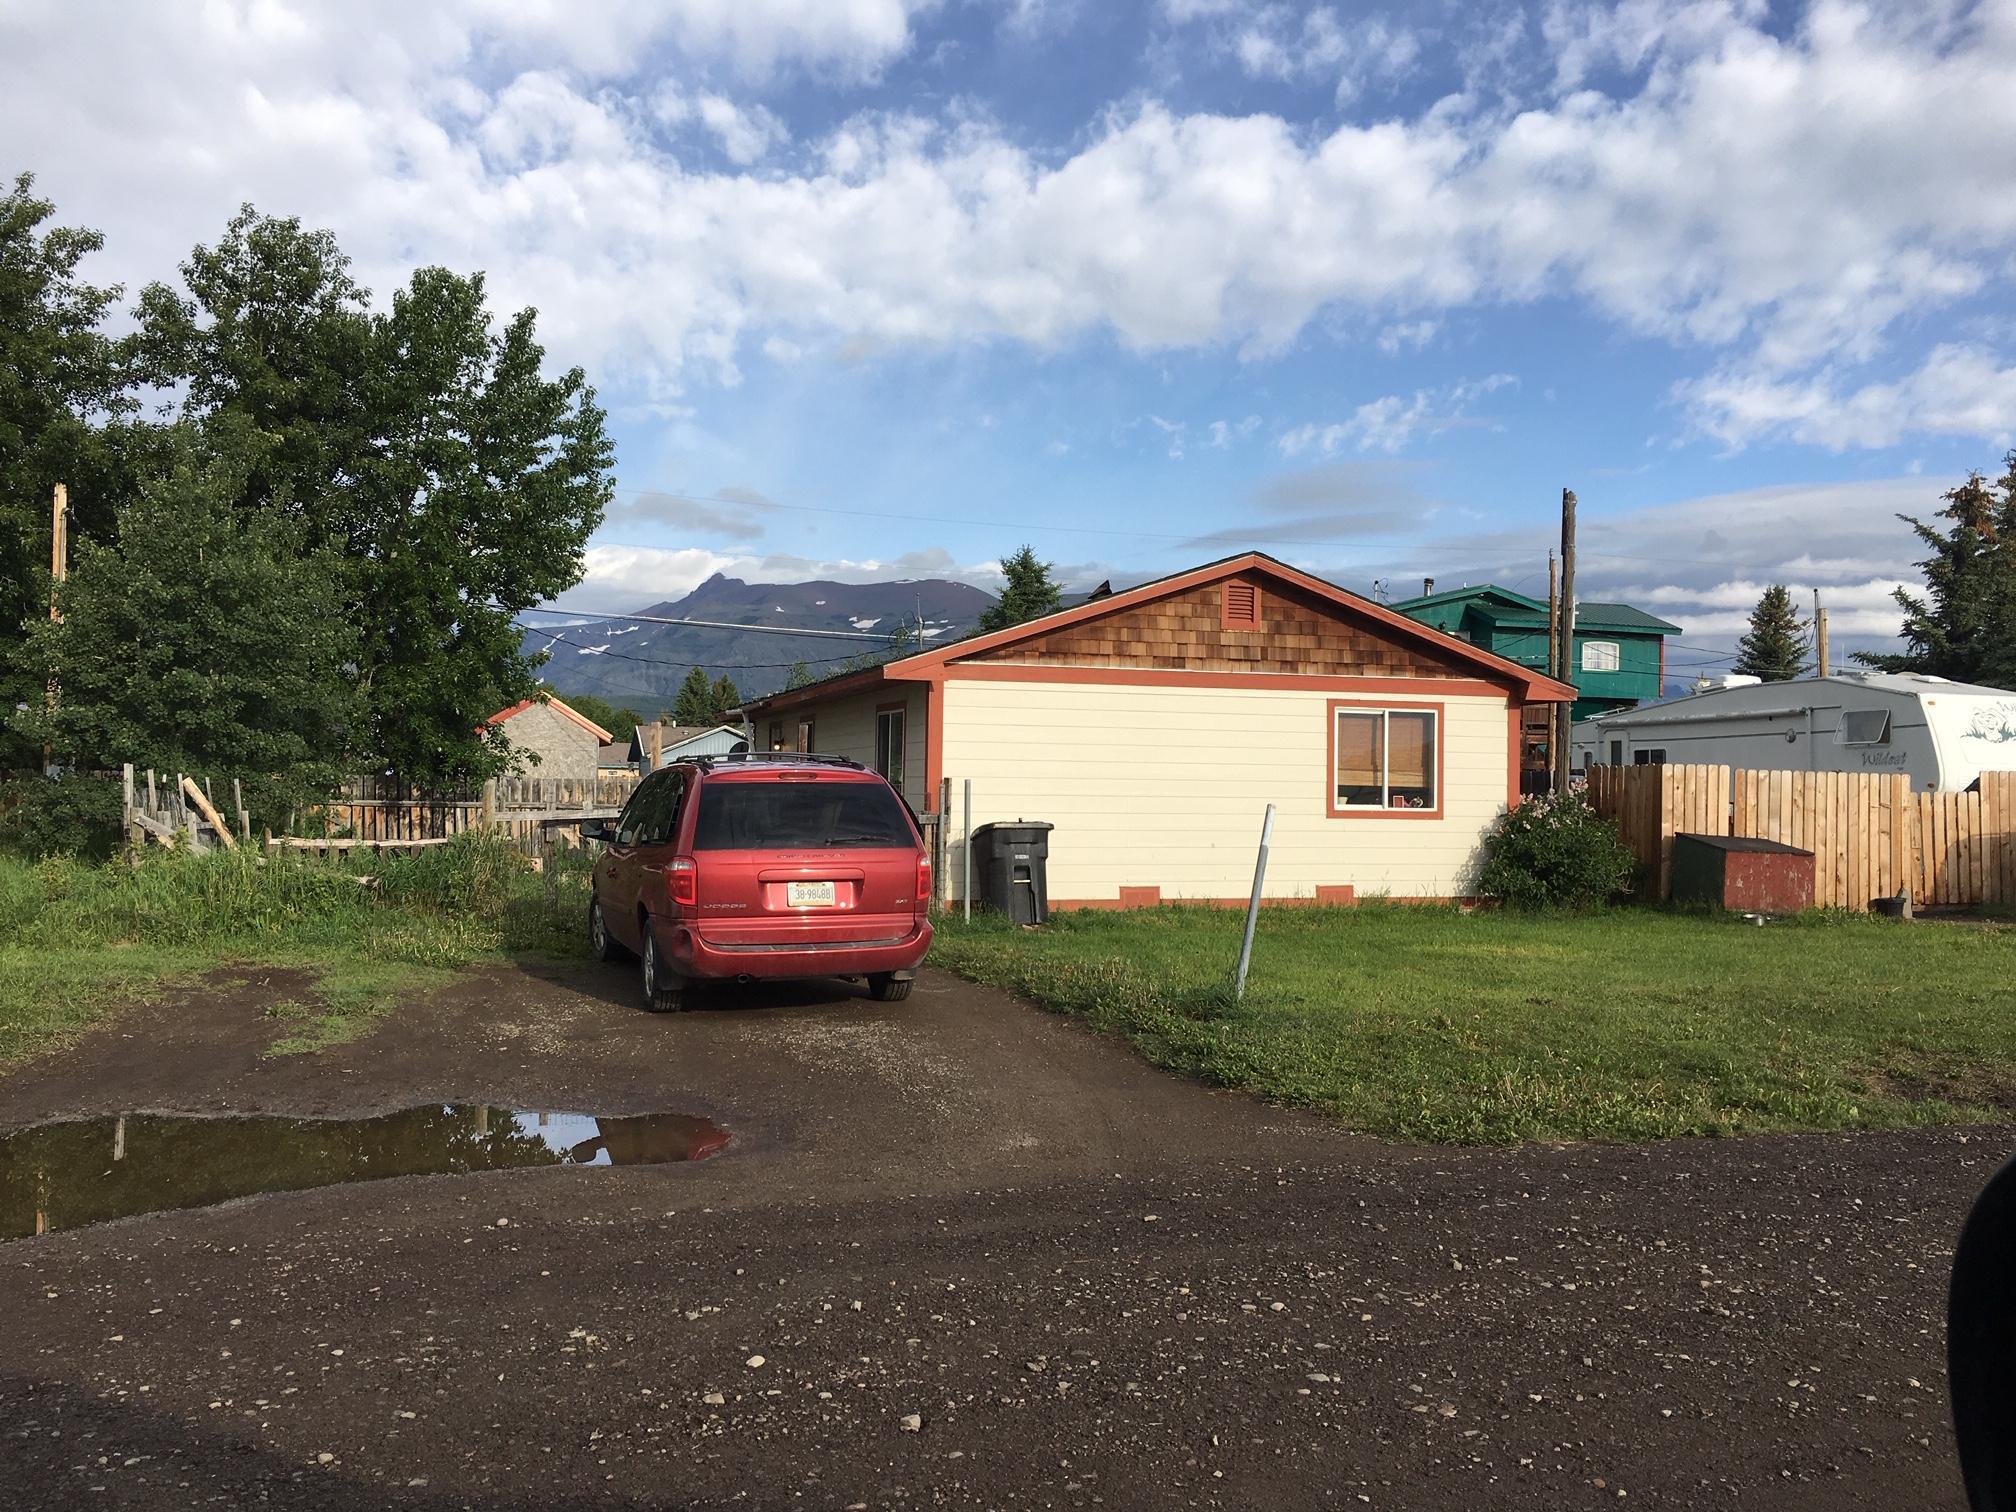 204 Rita Street, East Glacier Park, MT 59434